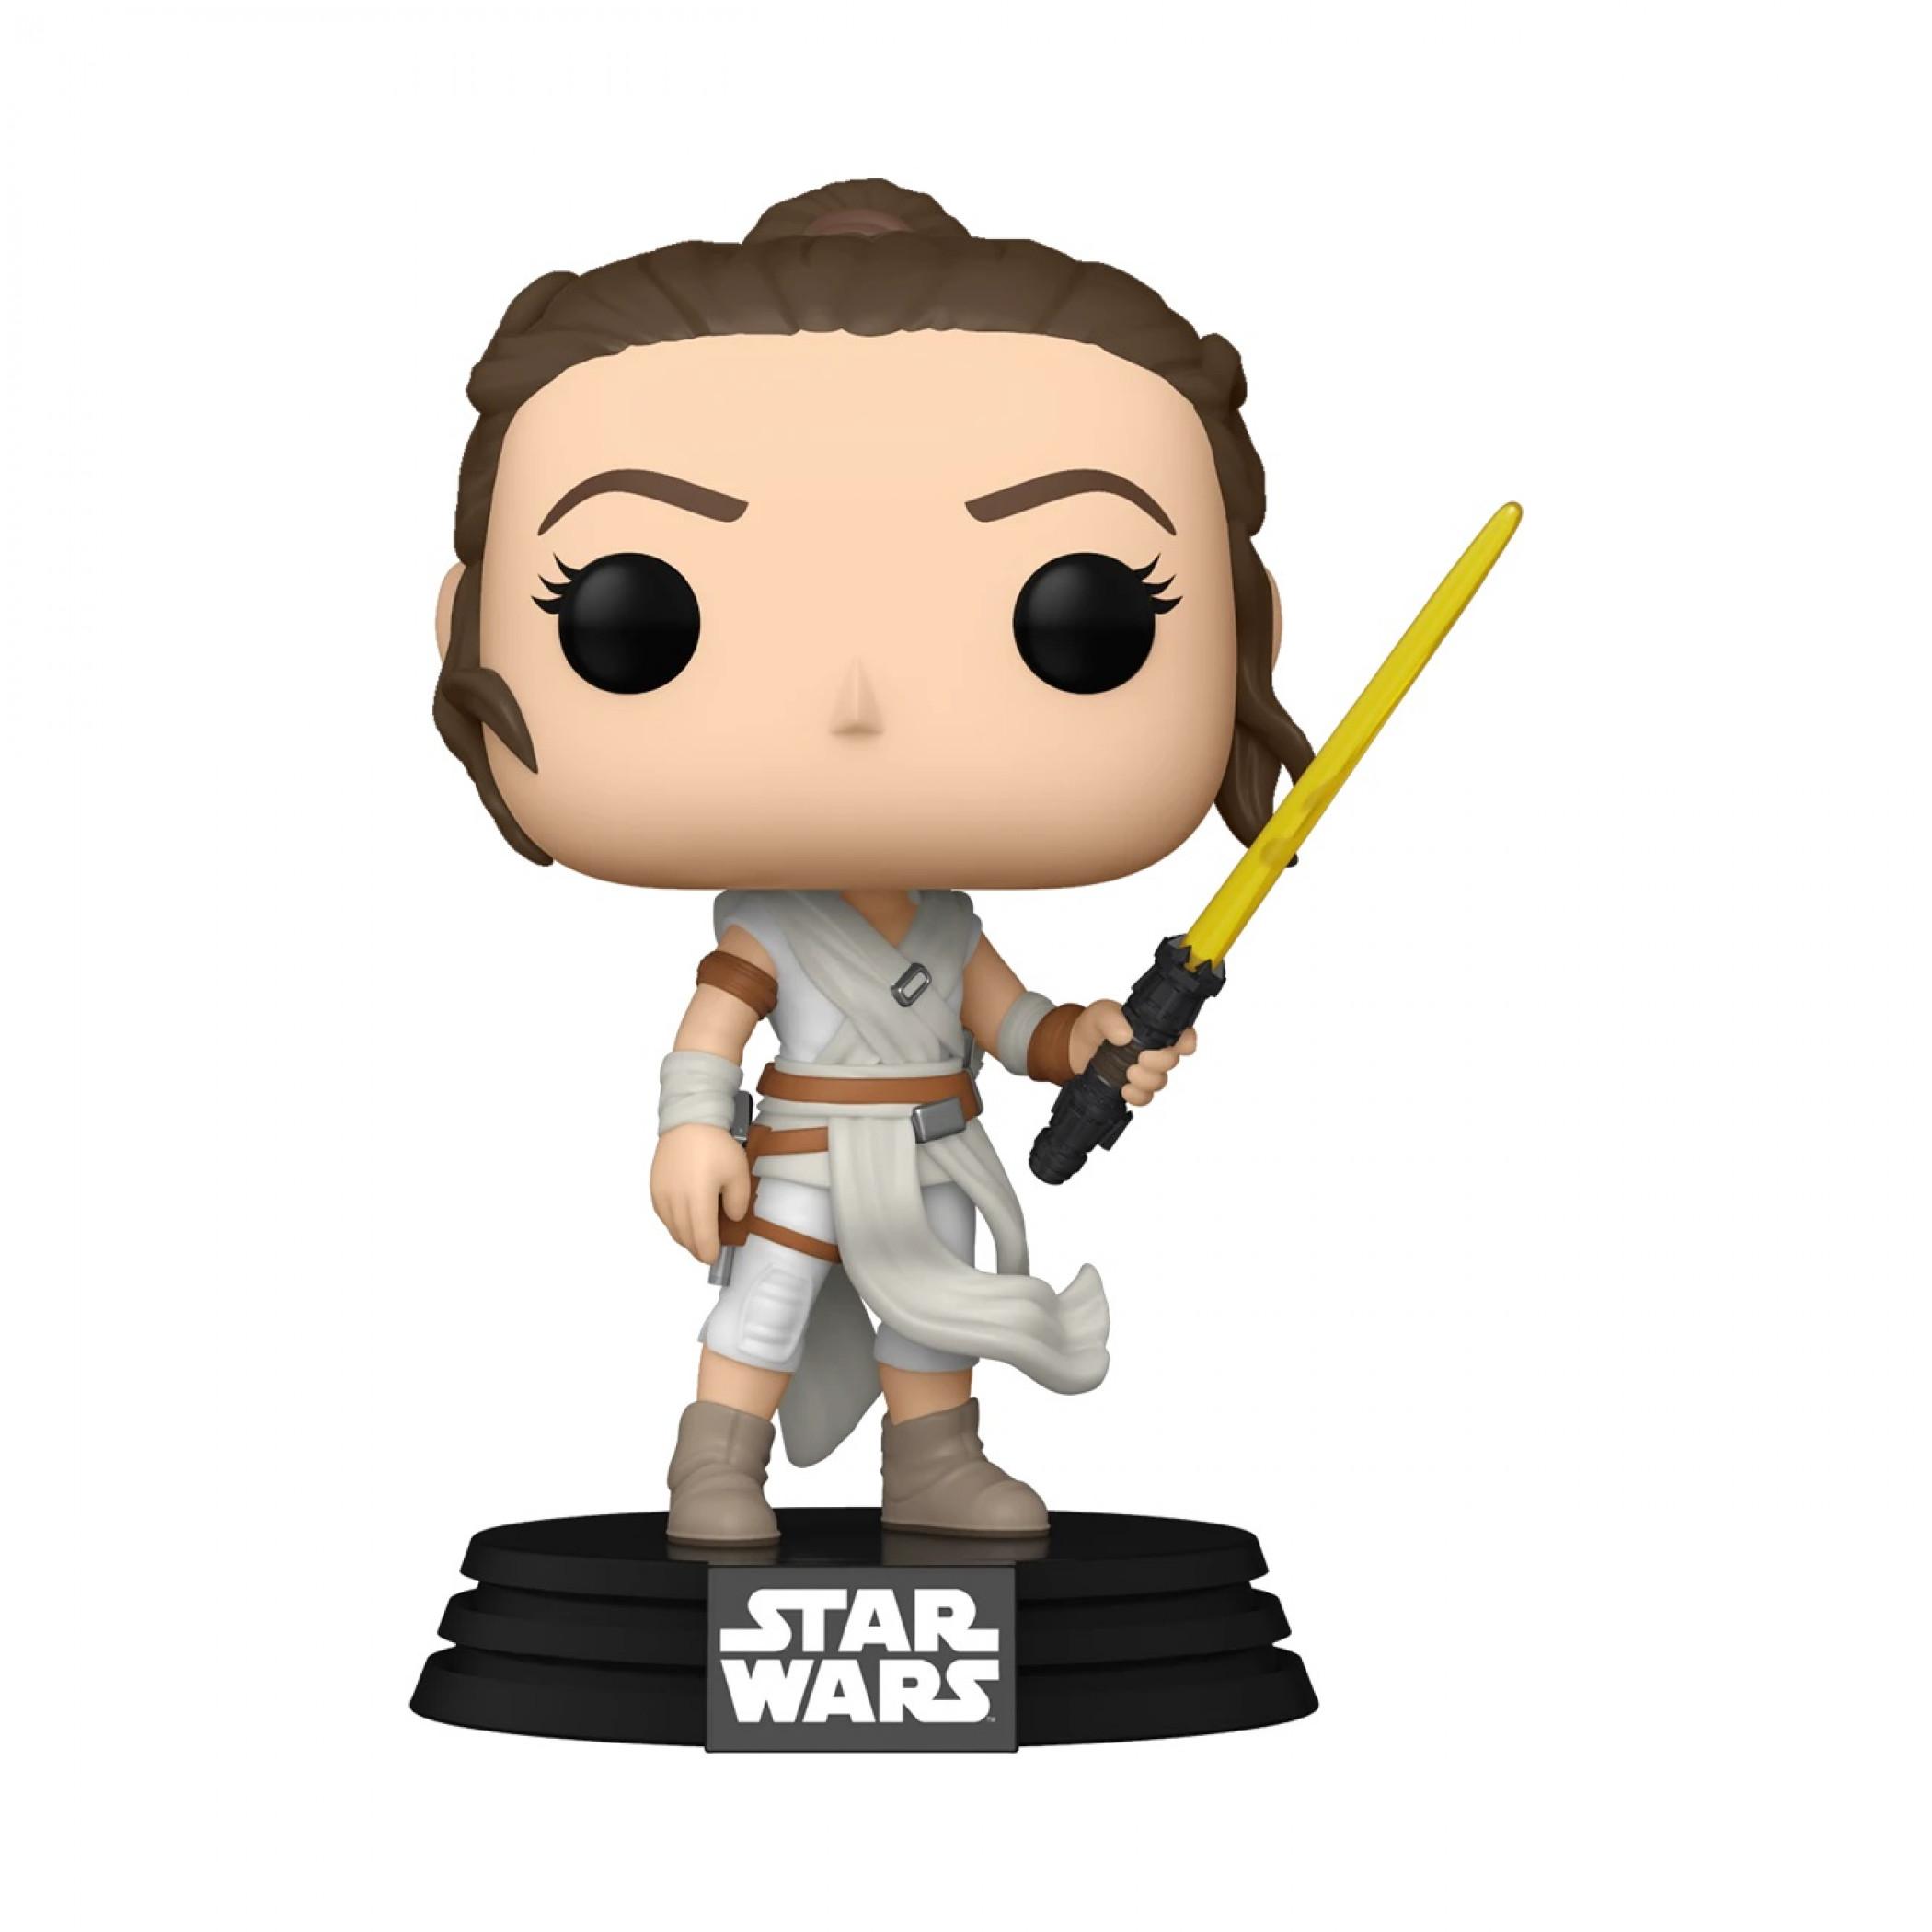 Star Wars Rey with Yellow Lightsaber Funko Pop! Vinyl Figure